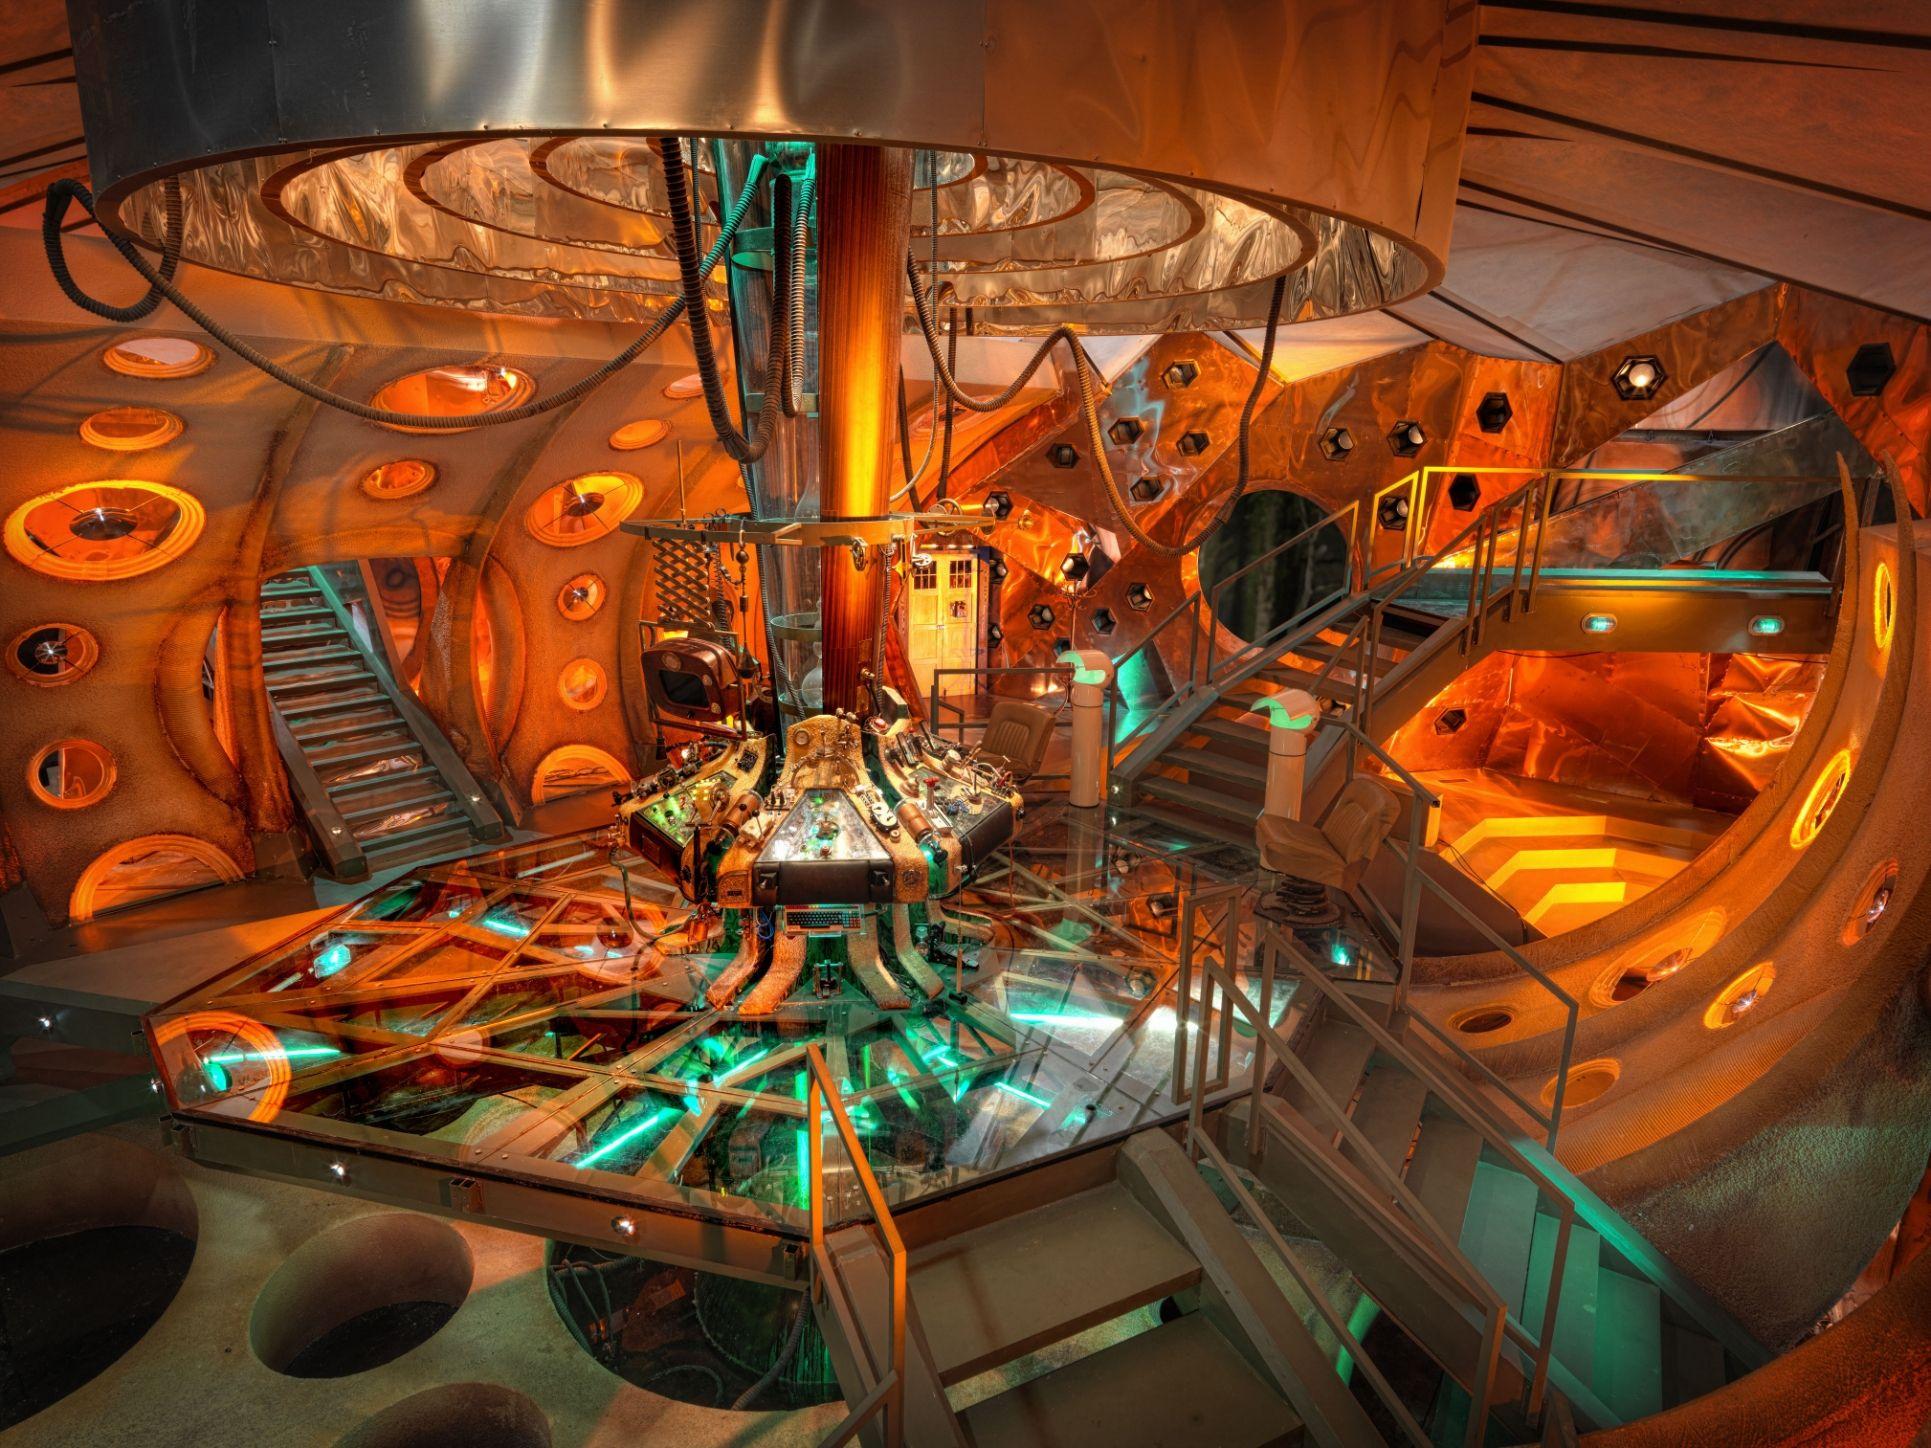 Good Wallpaper Home Screen Doctor Who - beaad8244097cf71a9464fa7ebaa09a3  2018_464811.jpg